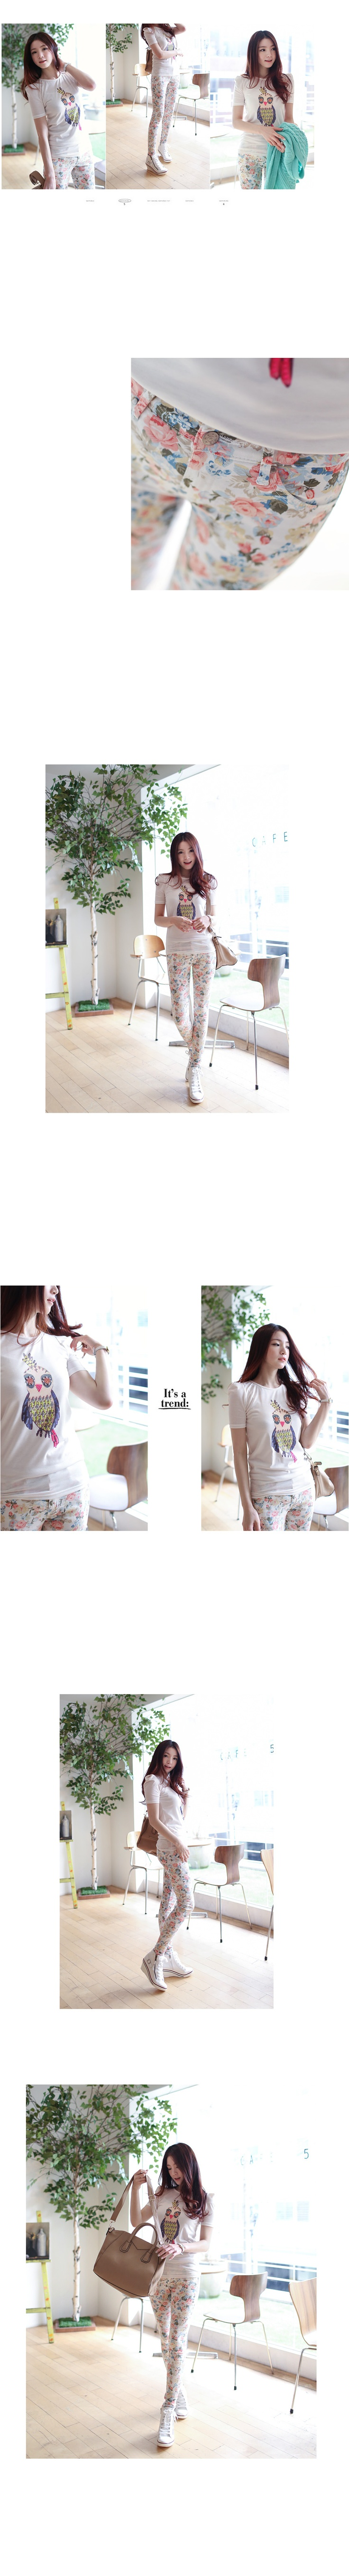 Jual jeans Korea Buy Sell Authentic Korean Skirt Fashion Online Sugarfun Skinny Jeans LFBTM_078_1229 $133 #malaysianbabes #malaysianshopper #malaysiashopper #malaysiashopping #malaysianshopping #onlineshop #onlineshopping #sggirls #koreafashion #koreanfashion #fashion #pikomiko #shoppingspree #spree #poslaju #posmalaysia #malaysiashop